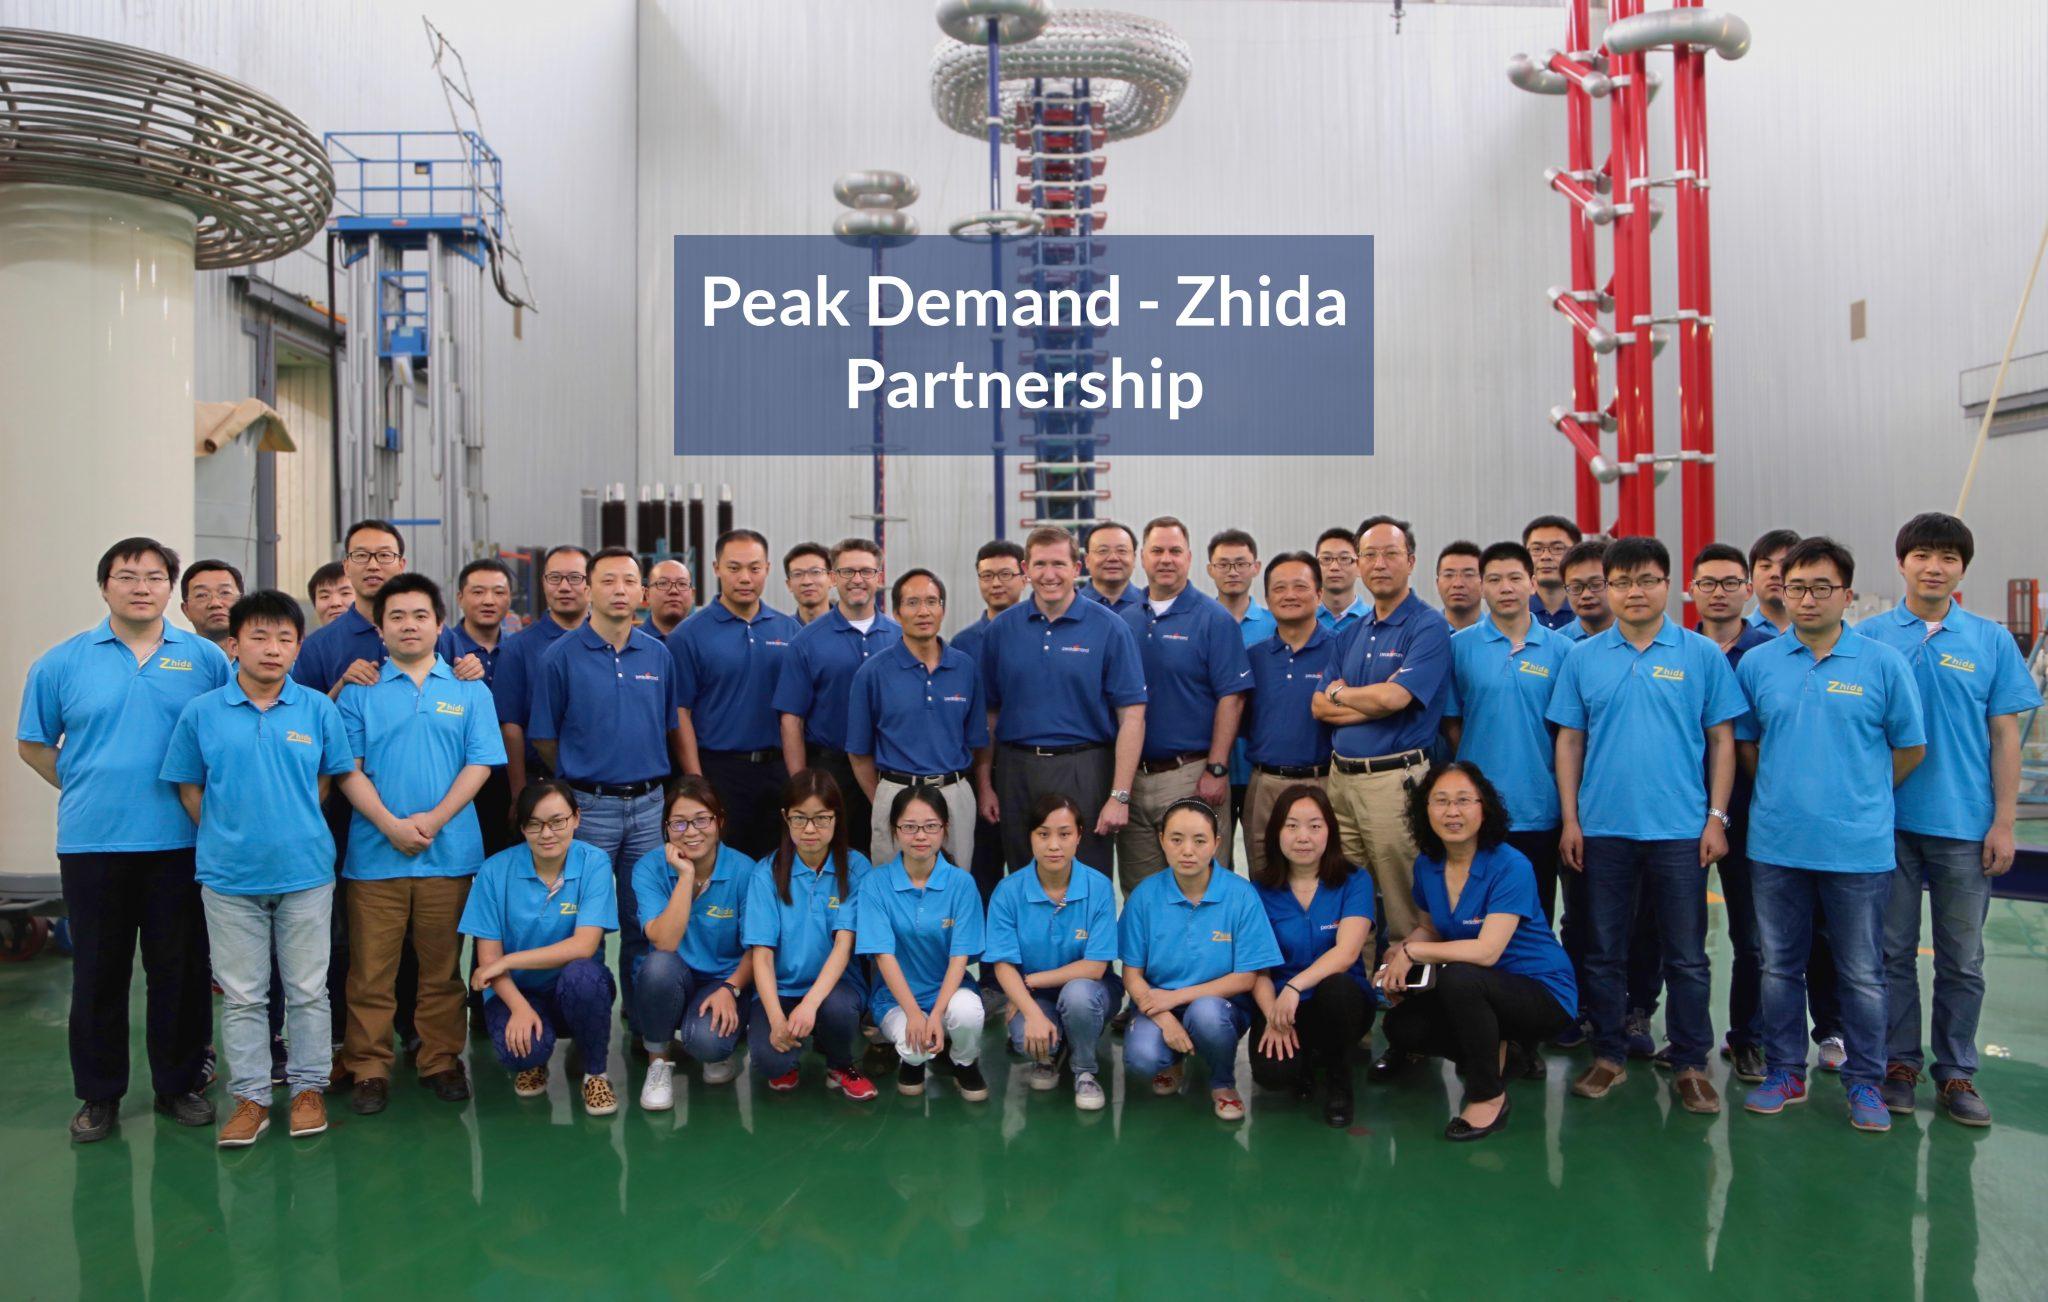 PD - Zhida Team